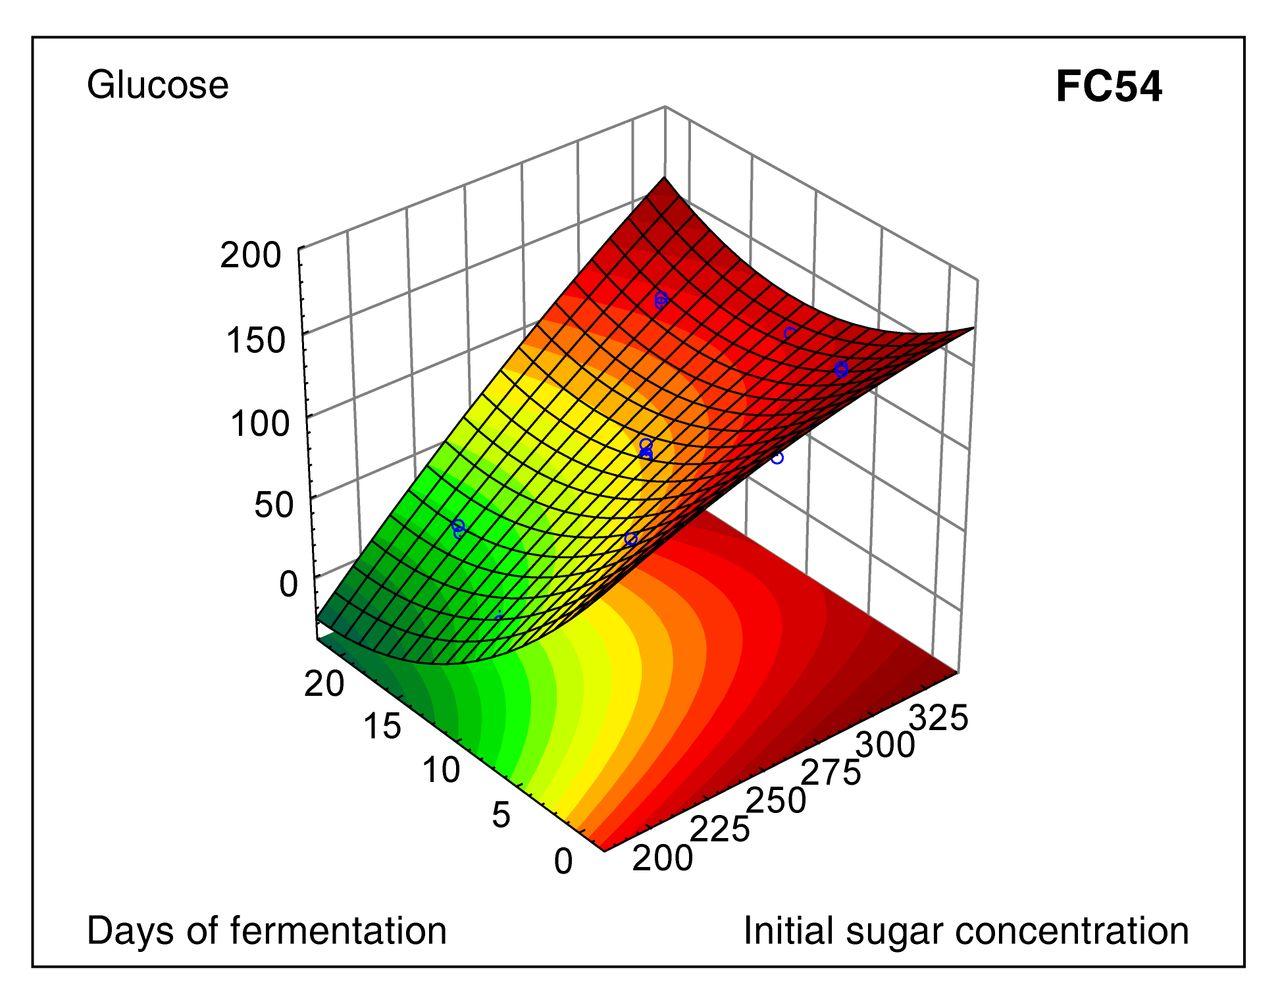 Modeling of the Fermentation Behavior of Starmerella